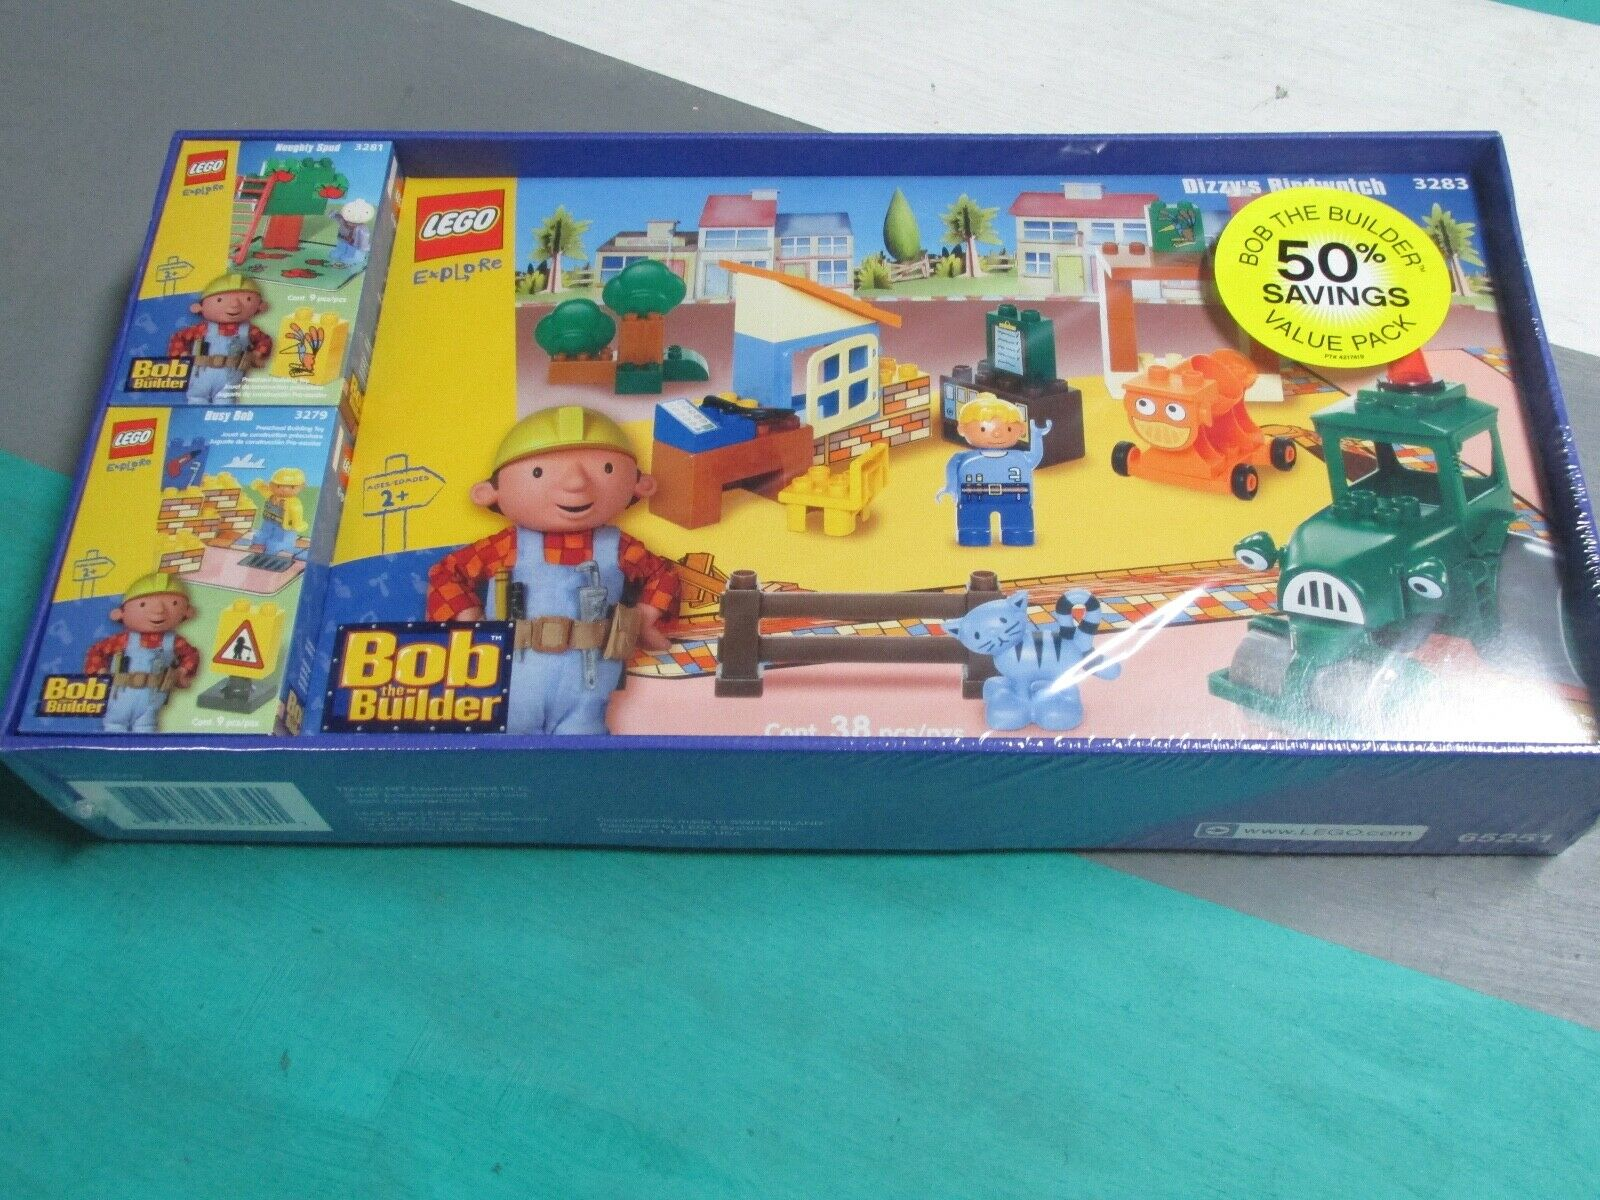 Nuevo LEGO Bob The Builder 3281 3279 3283 mareado's Birdwatch Travieso Spud ocupado Bob